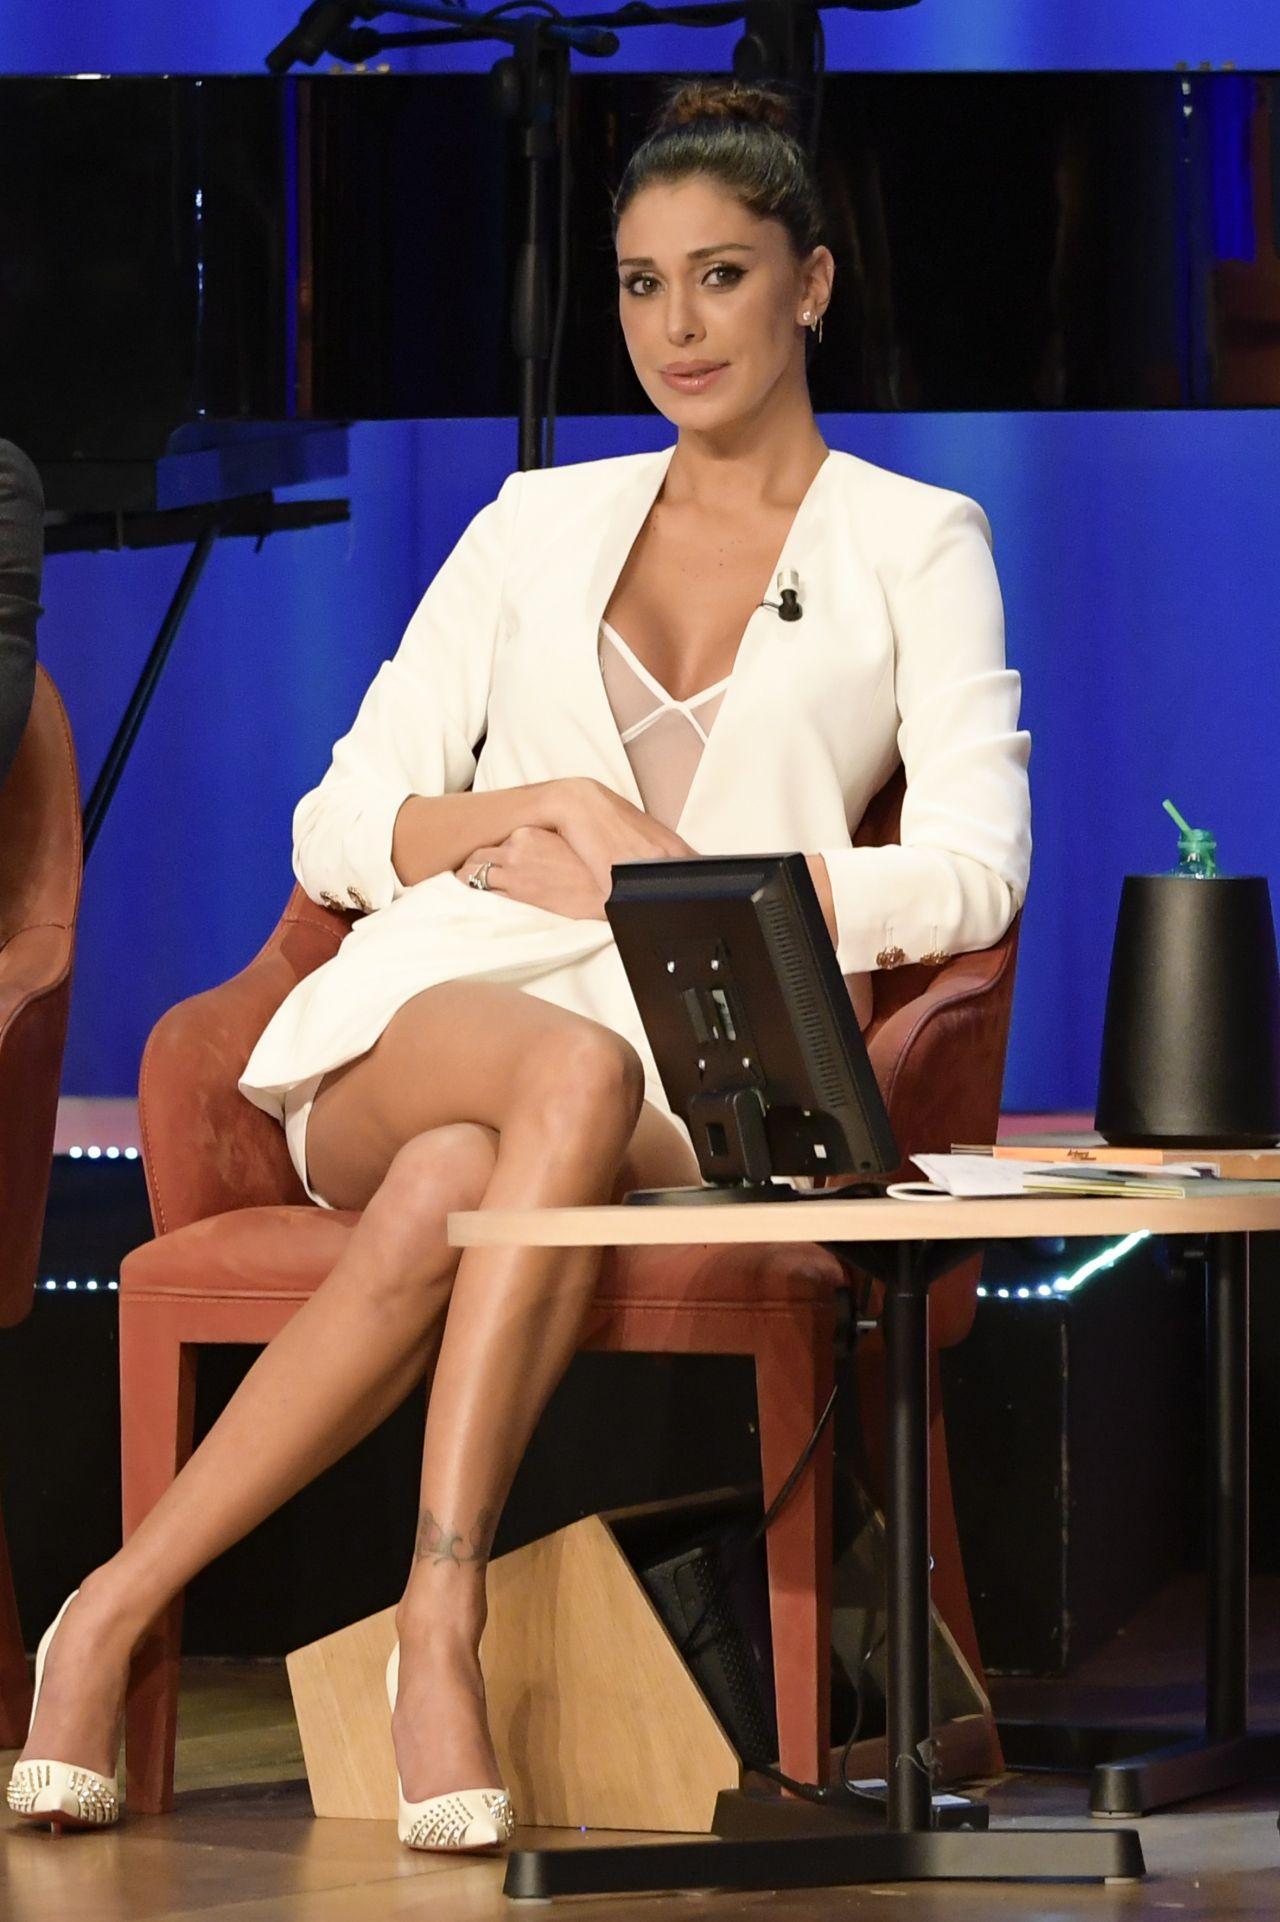 Belen Rodriguez Maurizio Costanzo Show In Rome 11 22 2017